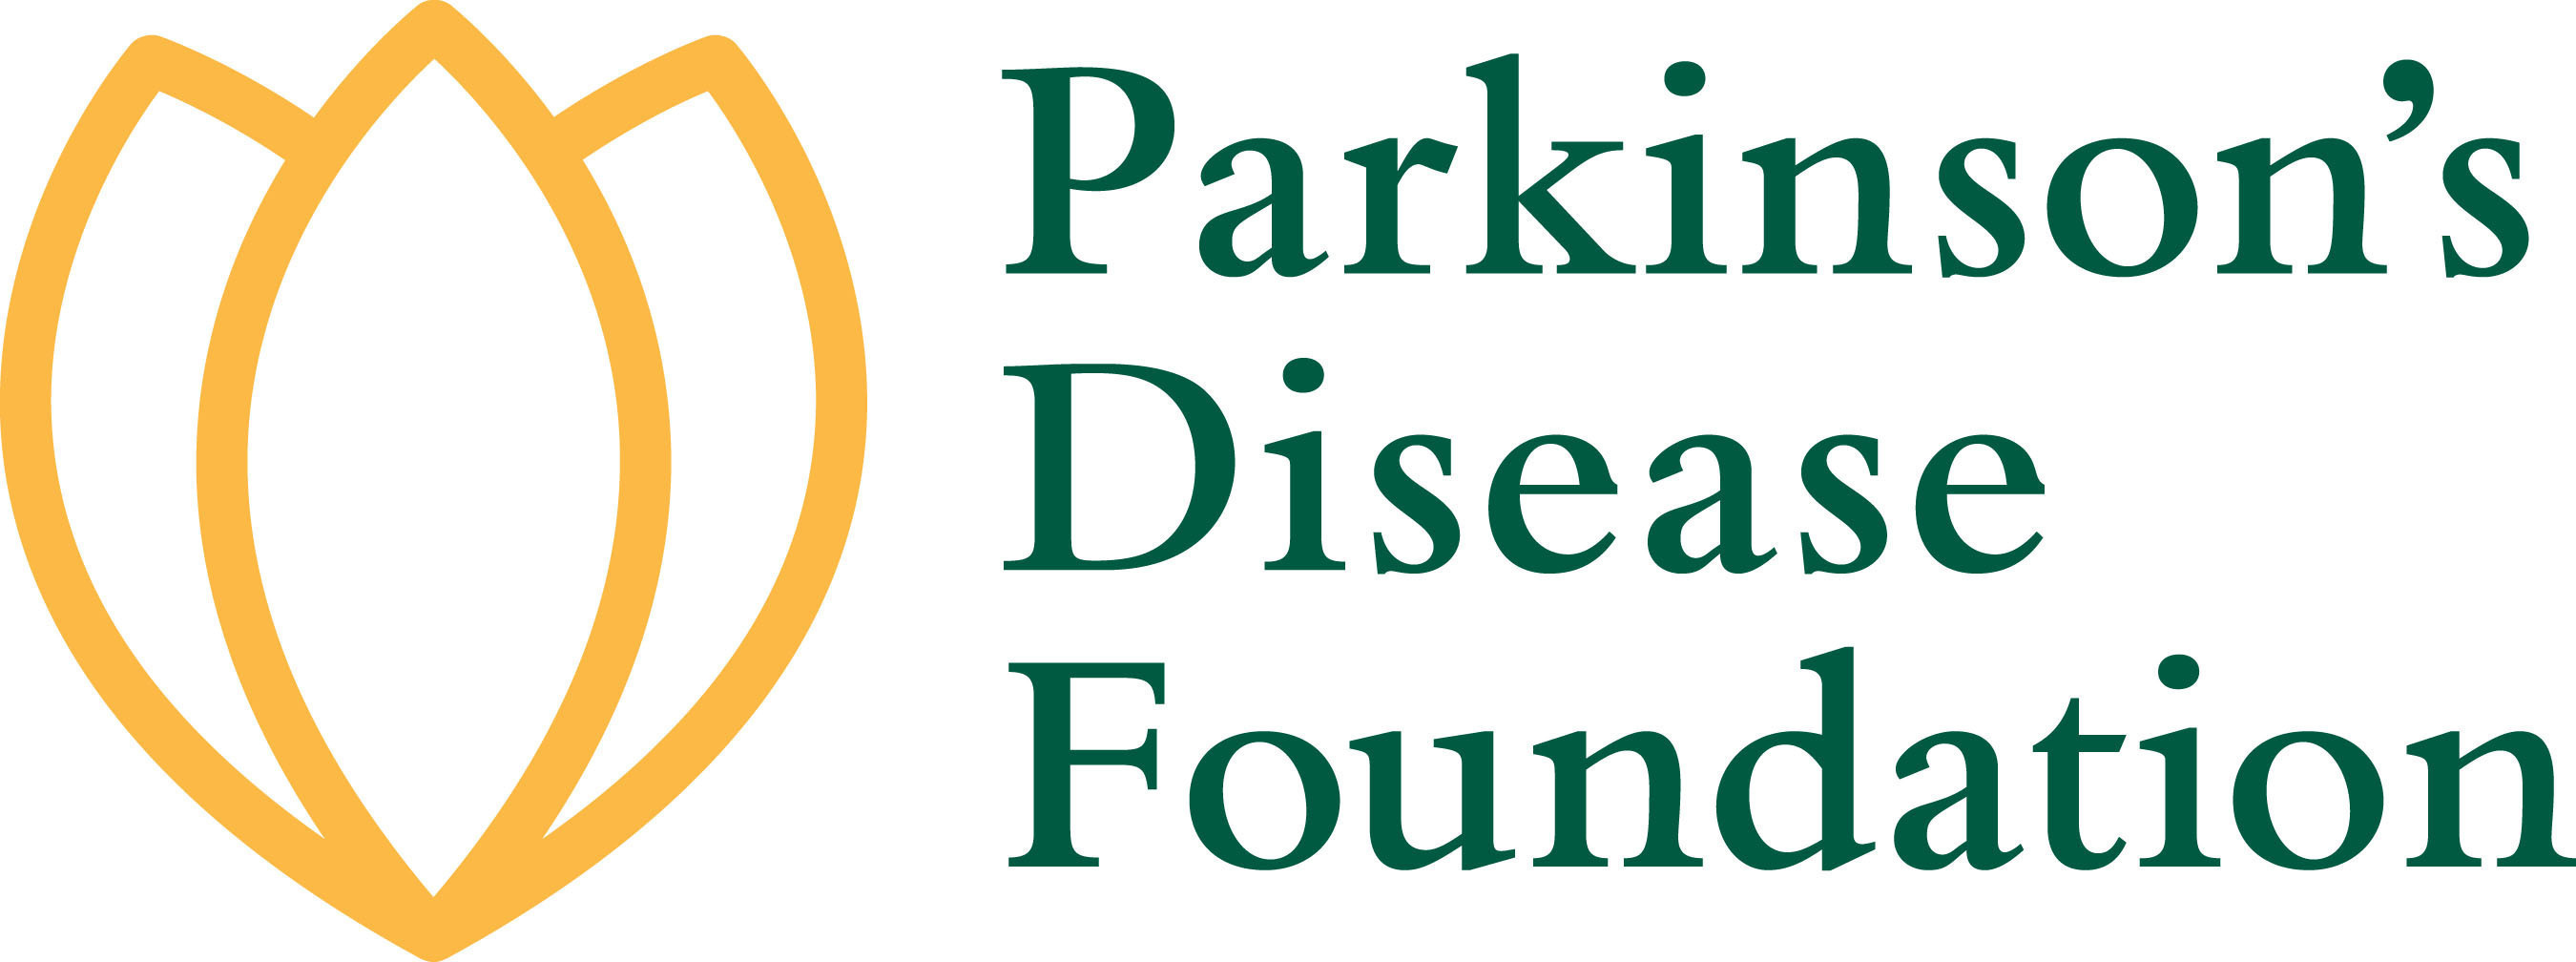 Parkinson's Disease Foundation logo. (PRNewsFoto/Parkinson's Disease Foundation)